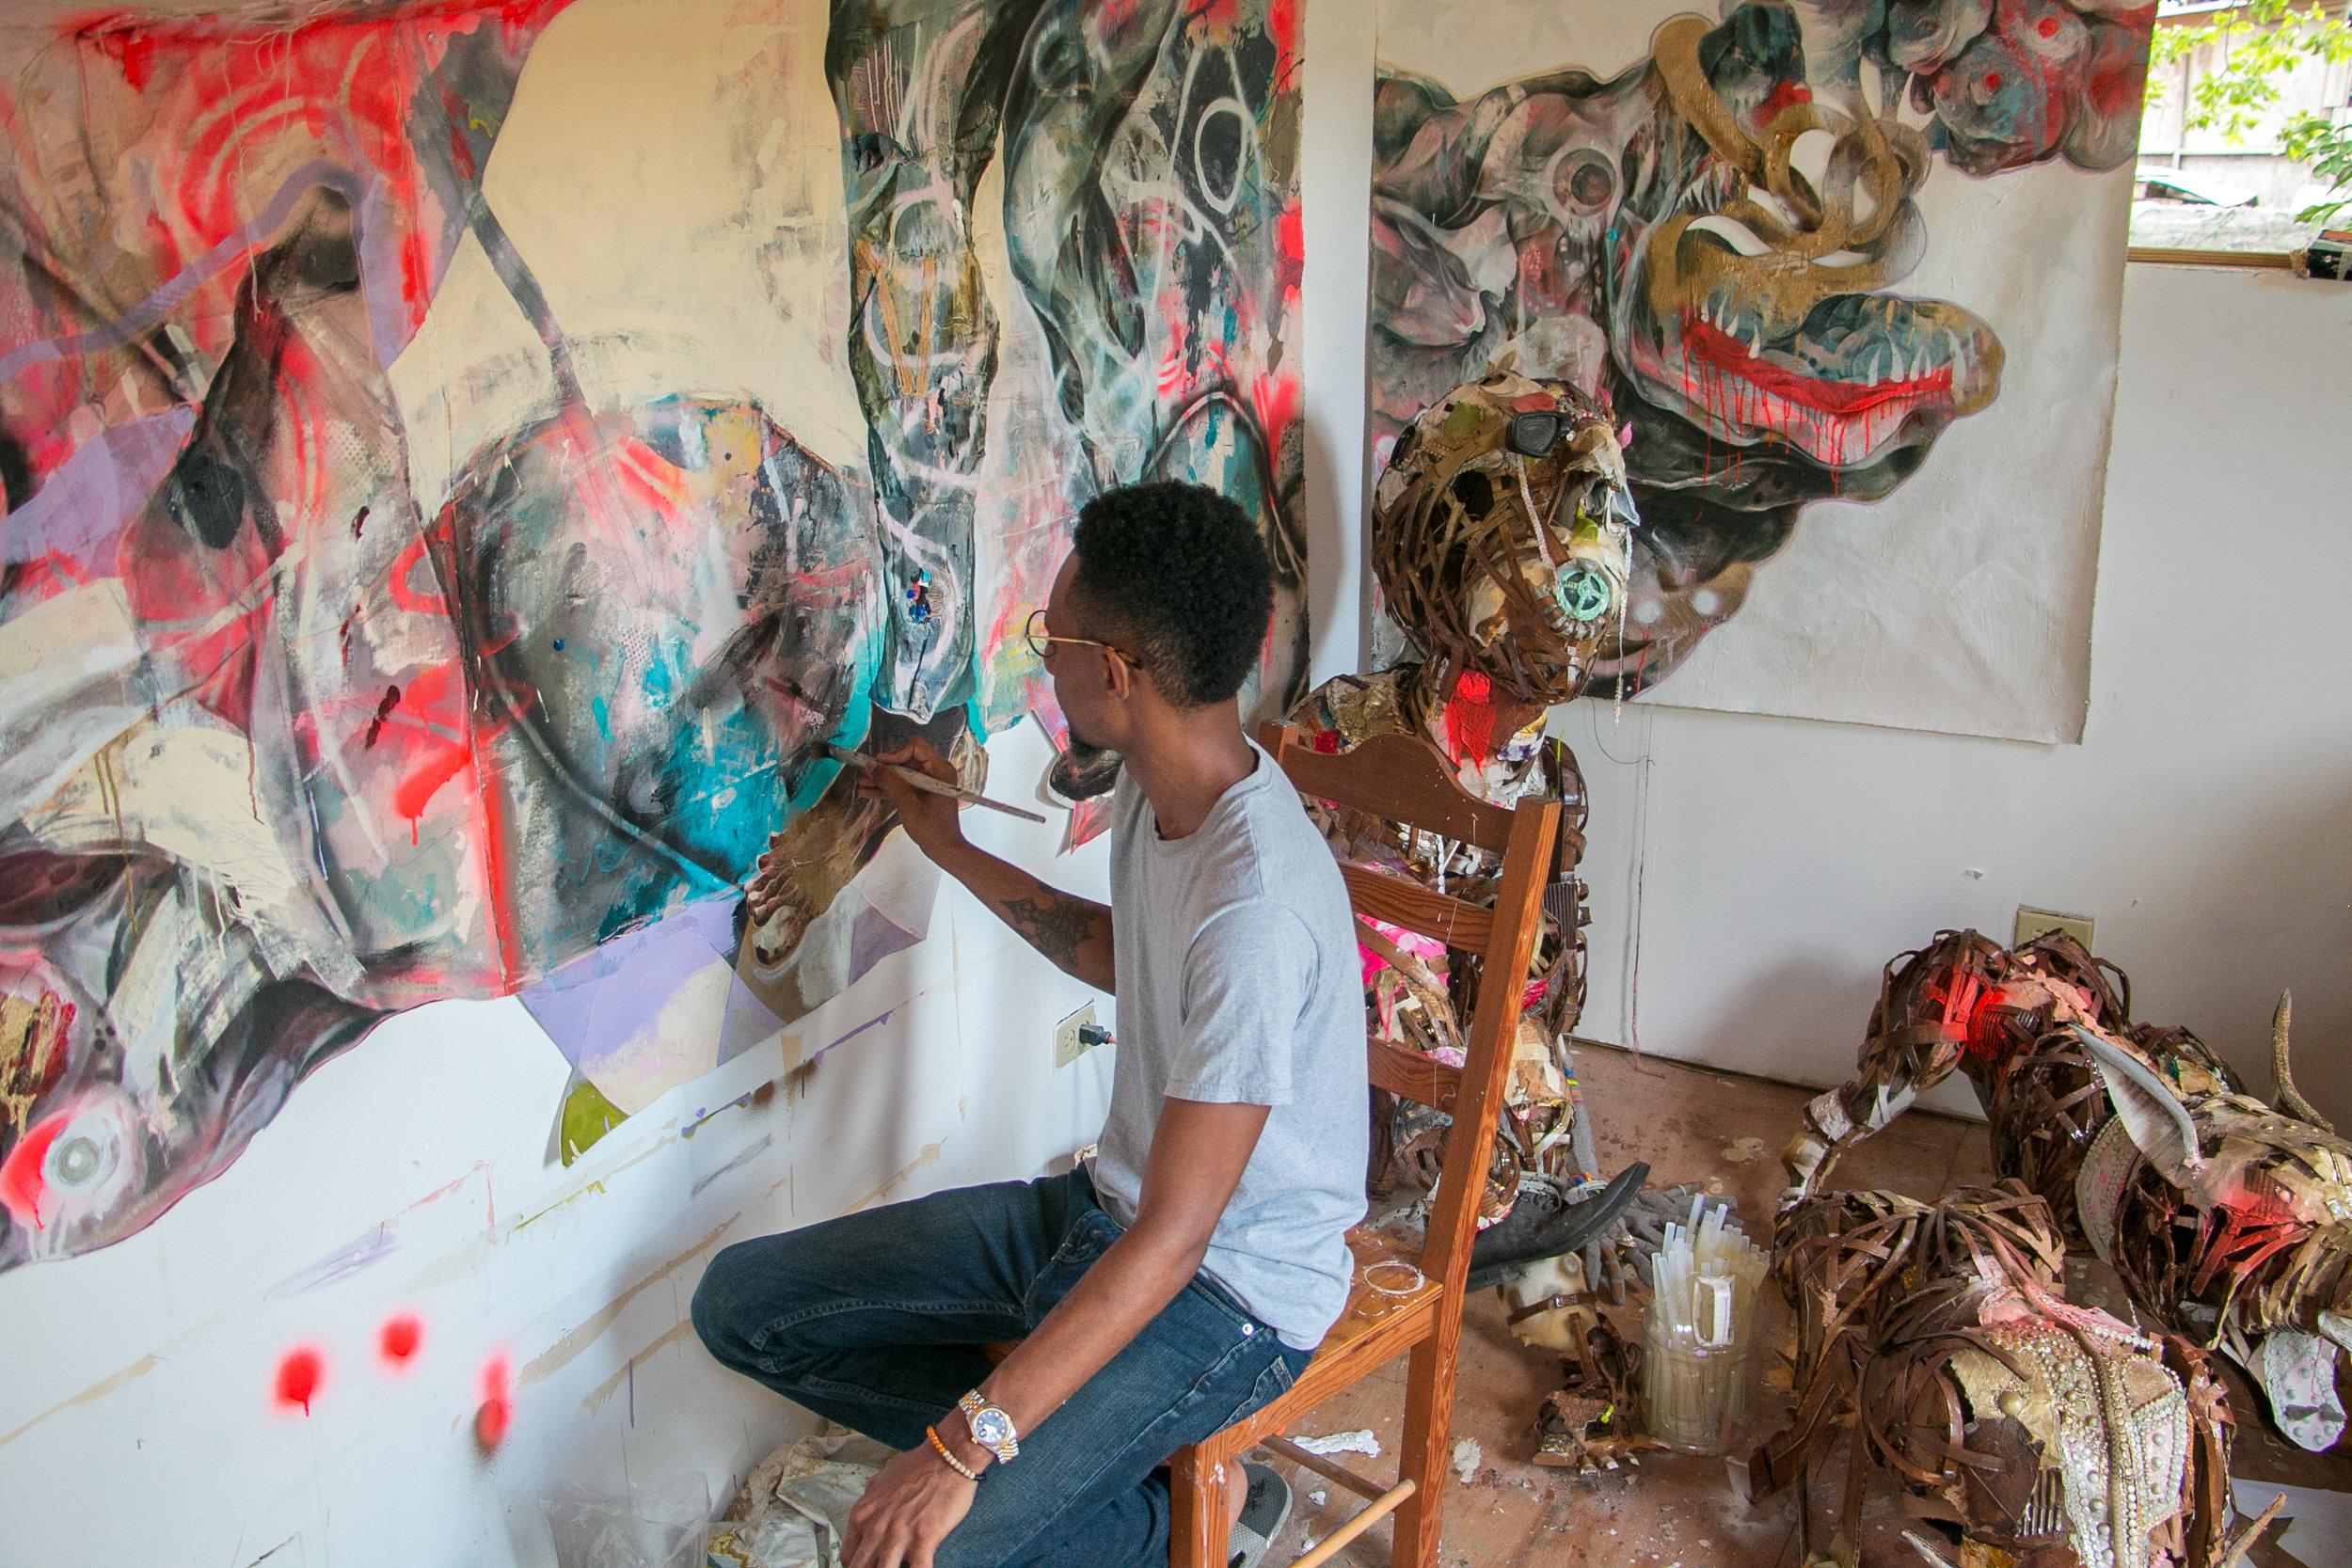 Lavar Munroe working in his studio on Milton Street, Nassau Bahamas.  (Photo by Keisha Oliver)